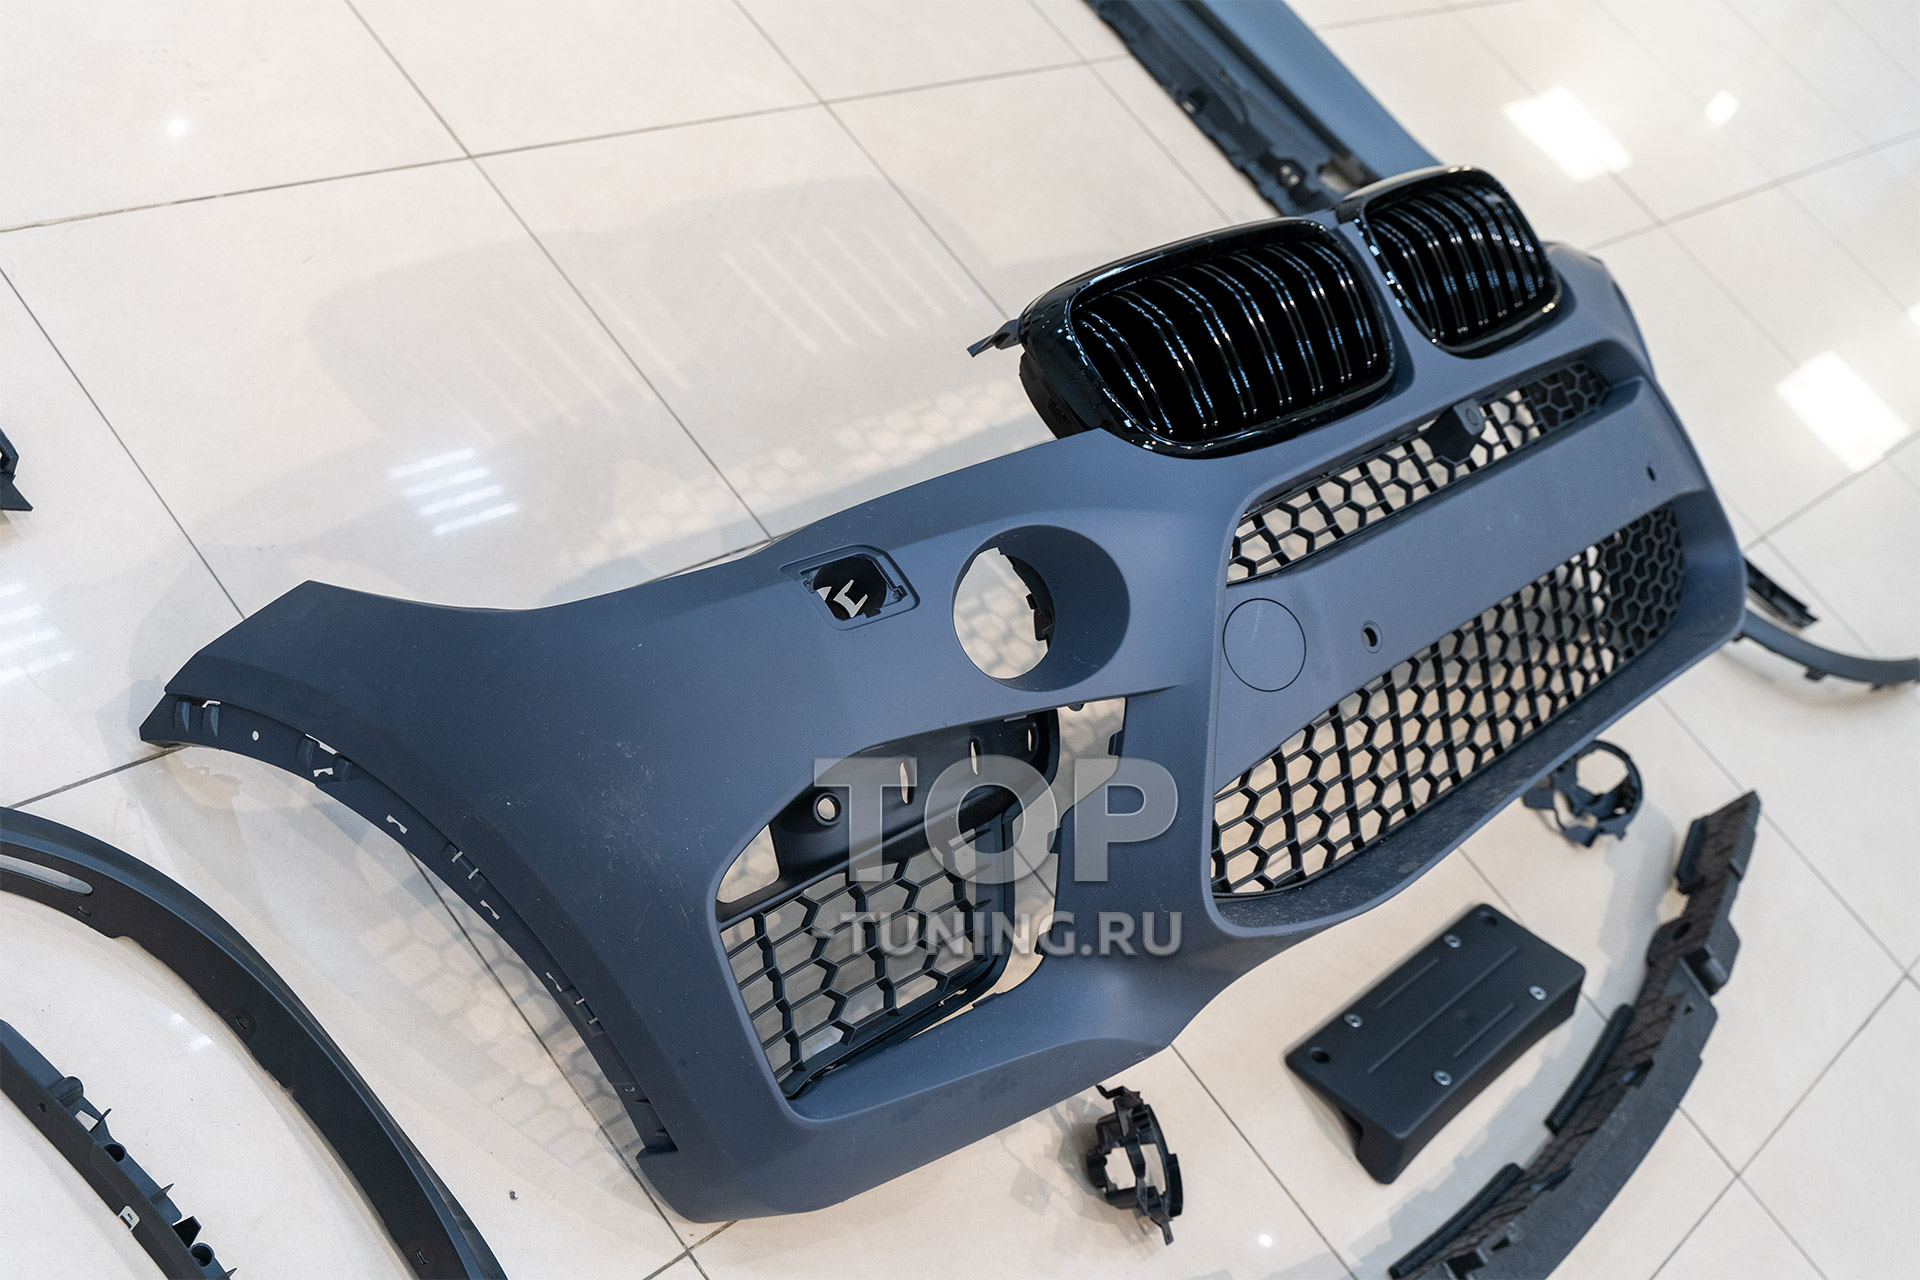 Тюнинг БМВ Х5 - обвес X5M f85